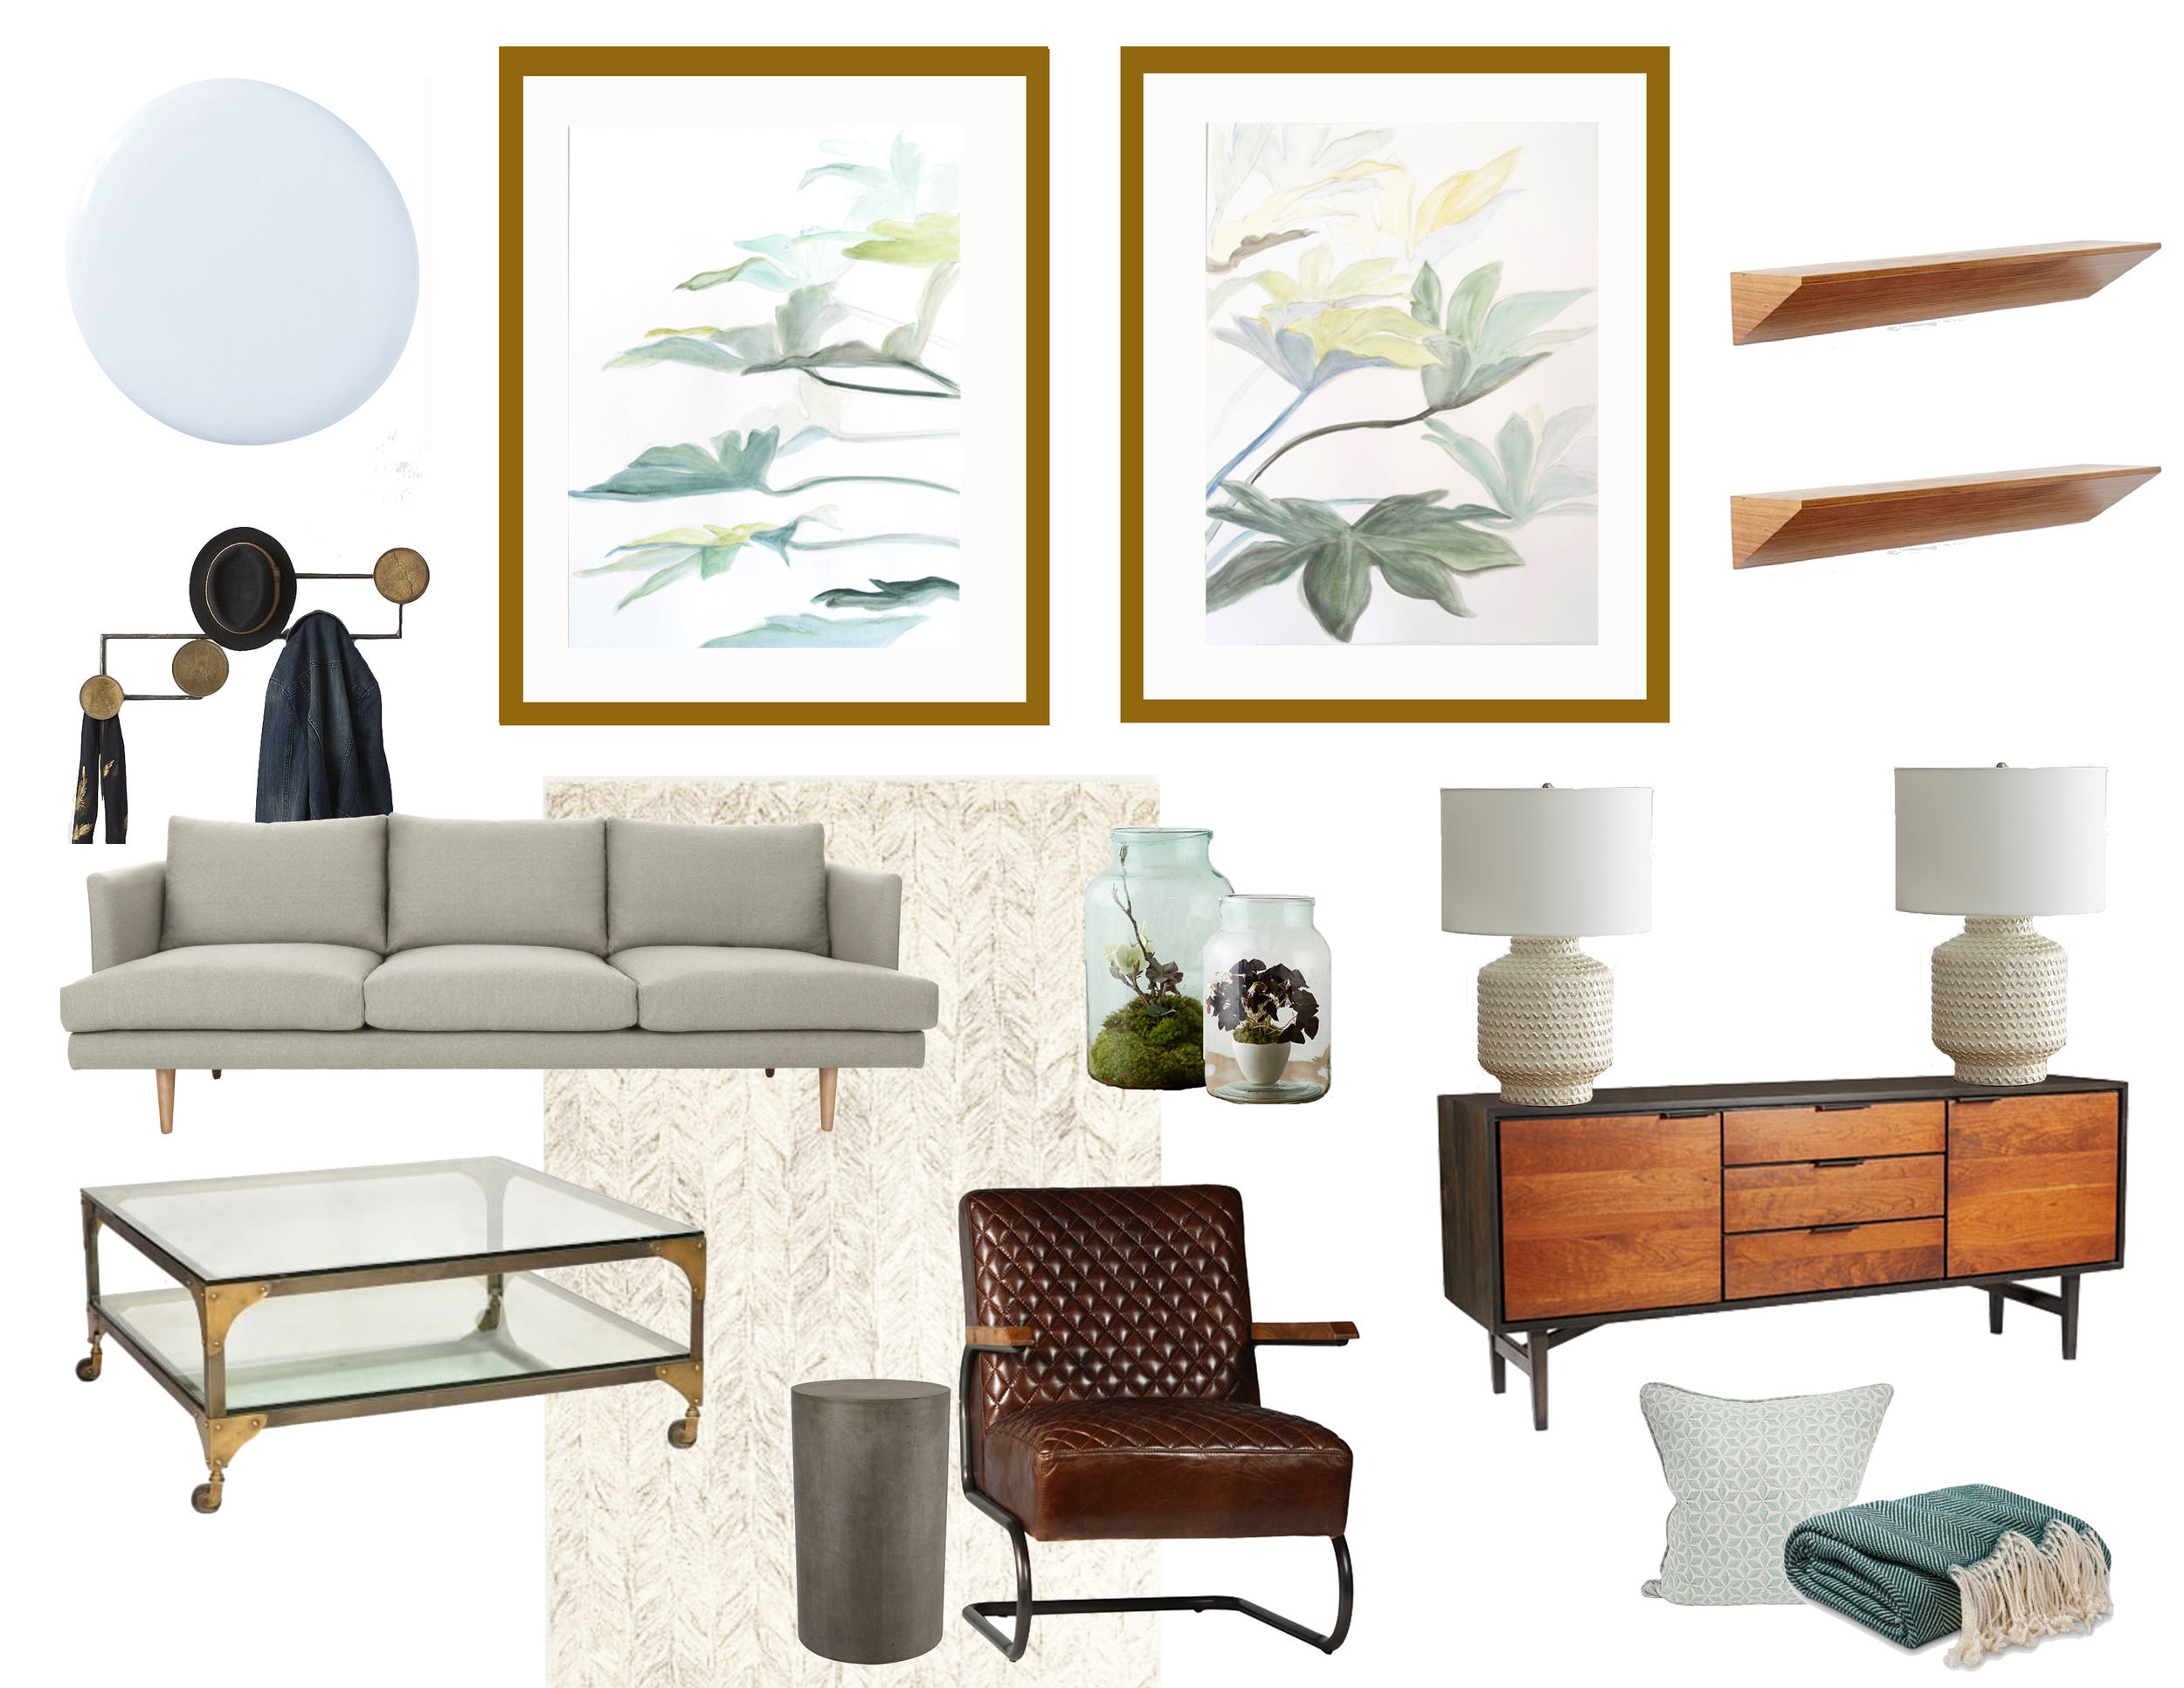 Paint  / Coat Rack  /  Sofa  /  Coffee Table  /  Rug  /  Glass Jars  /  Leather Chair  /  Pedestal  /  Console  /  Pillow  /  Lamp  /  Shelf / Throw